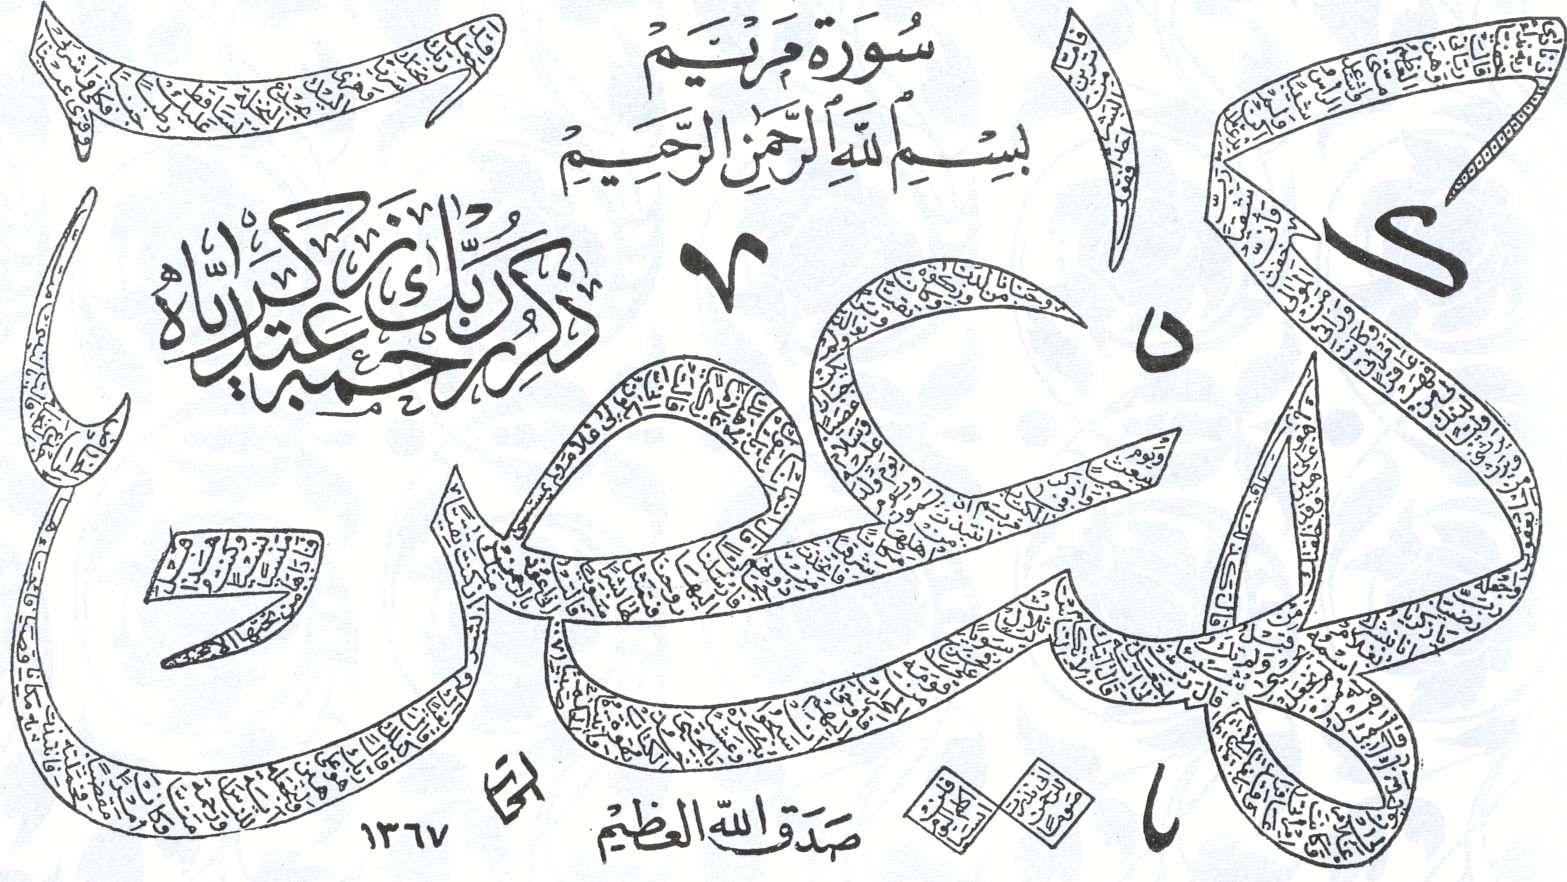 من سوره مريم ك ه ي ع ص Calligraphy Art Arabic Art Art